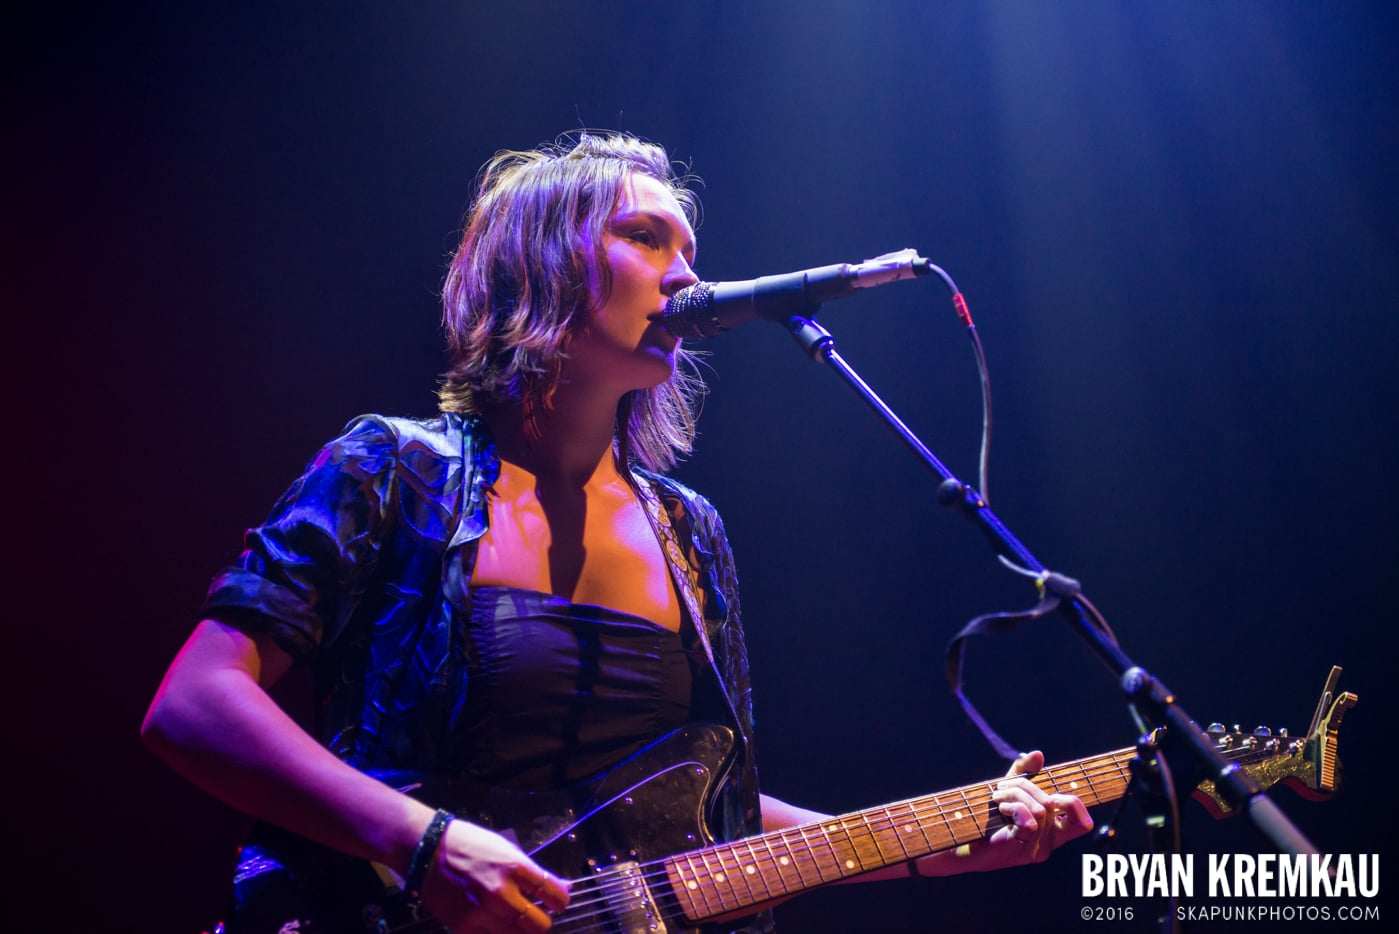 Meredith Sheldon @ Gramercy Theatre, NYC - 11.12.14 (9)